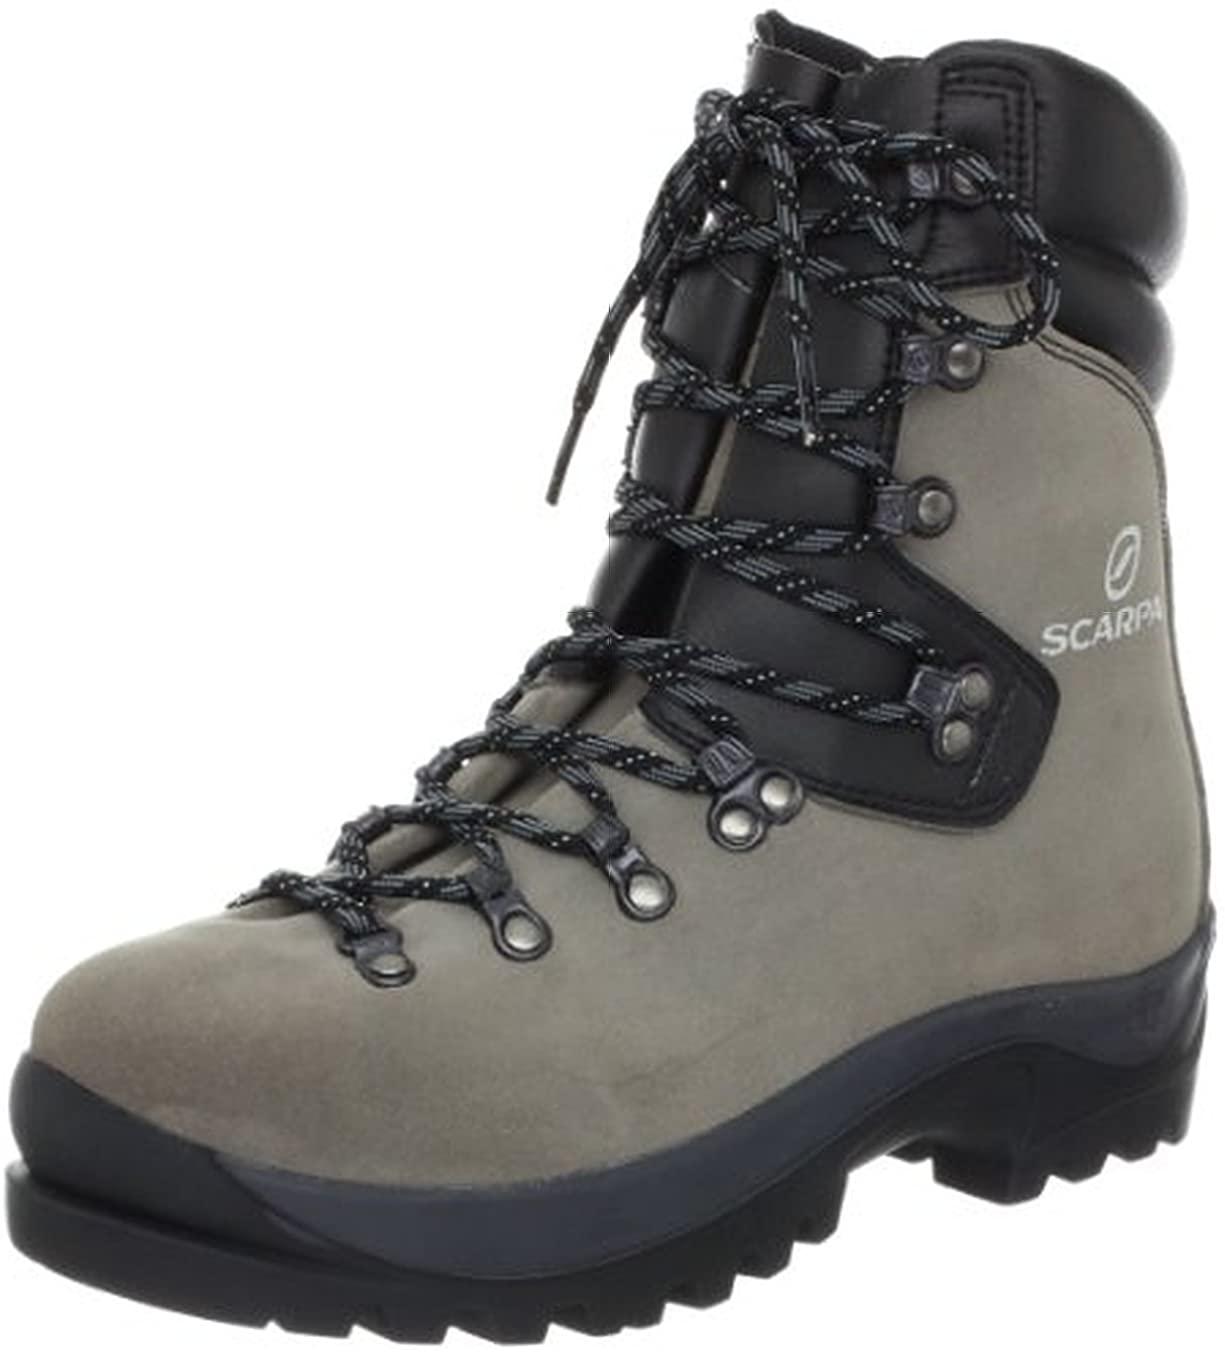 SCARPA Fuego Mountaineering Boots & E-Tip Glove Bundle